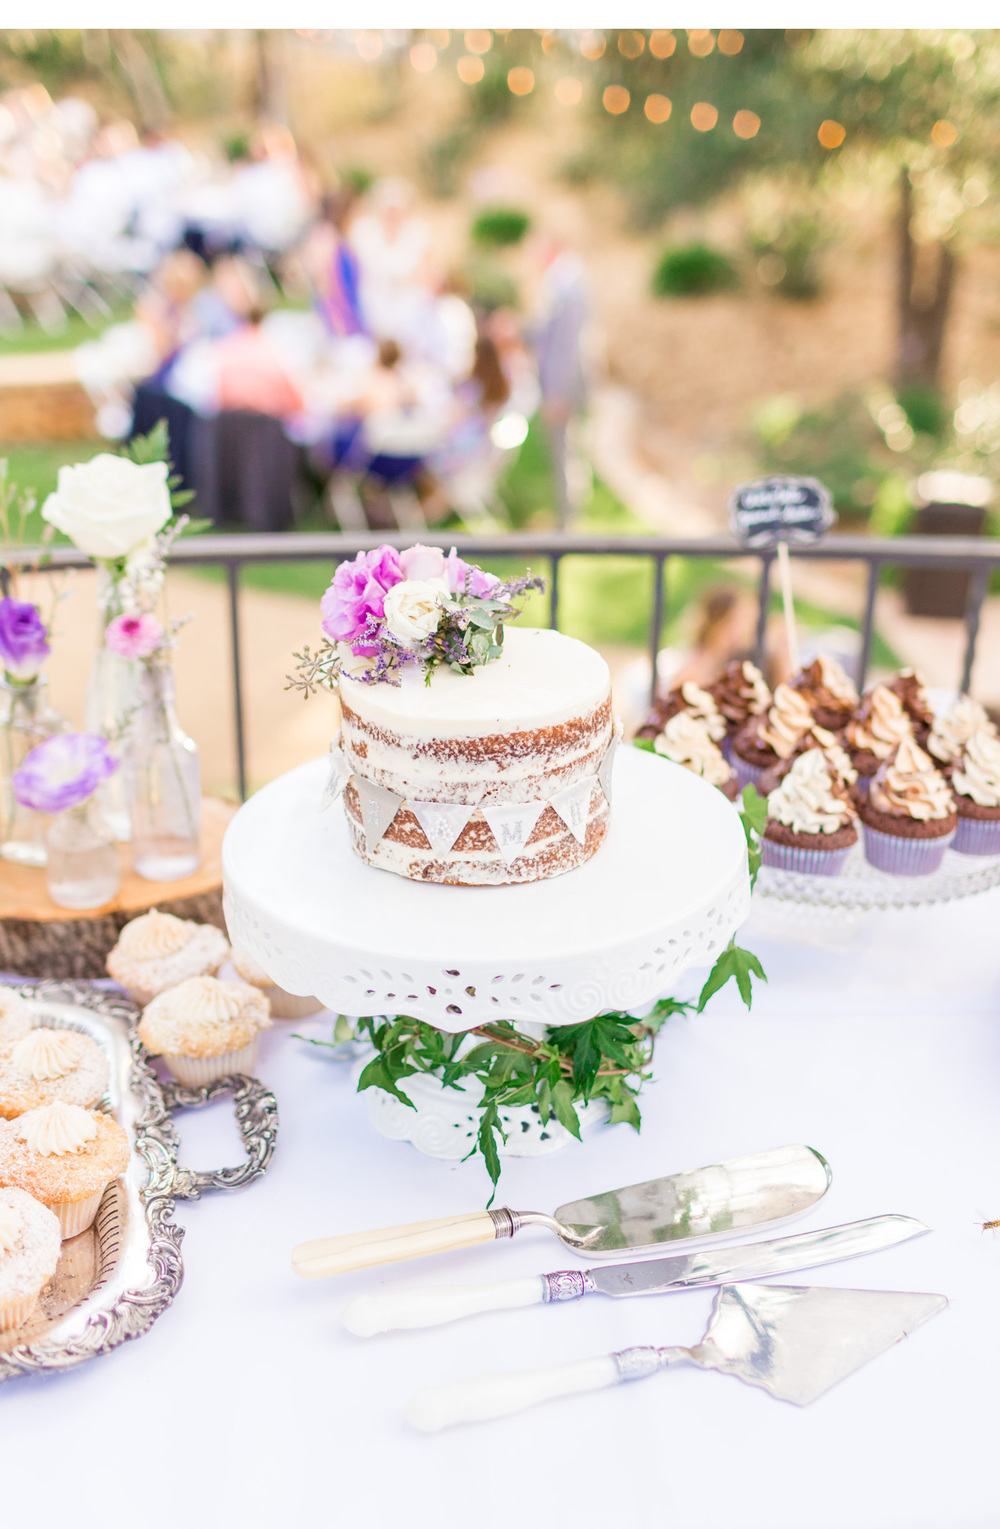 Salzman-Cake--Natalie-Schutt-Photography_03.jpg